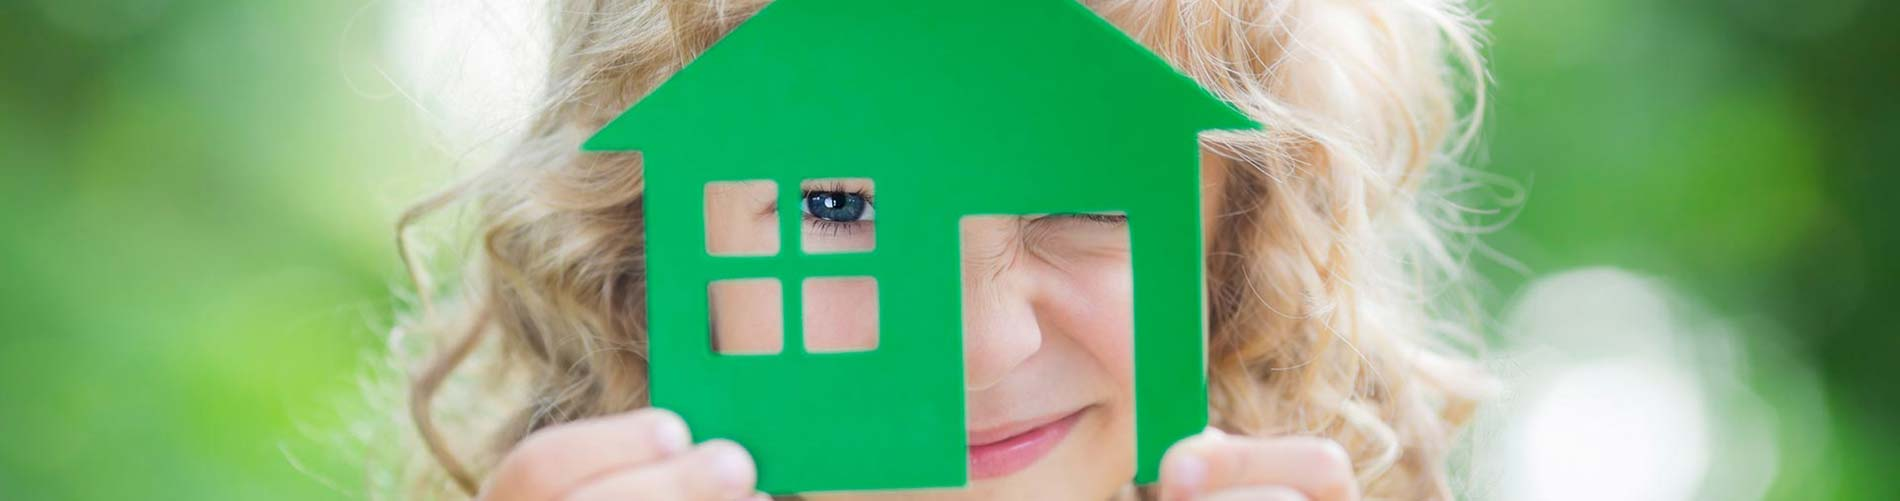 Kind mit Miniaturhaus